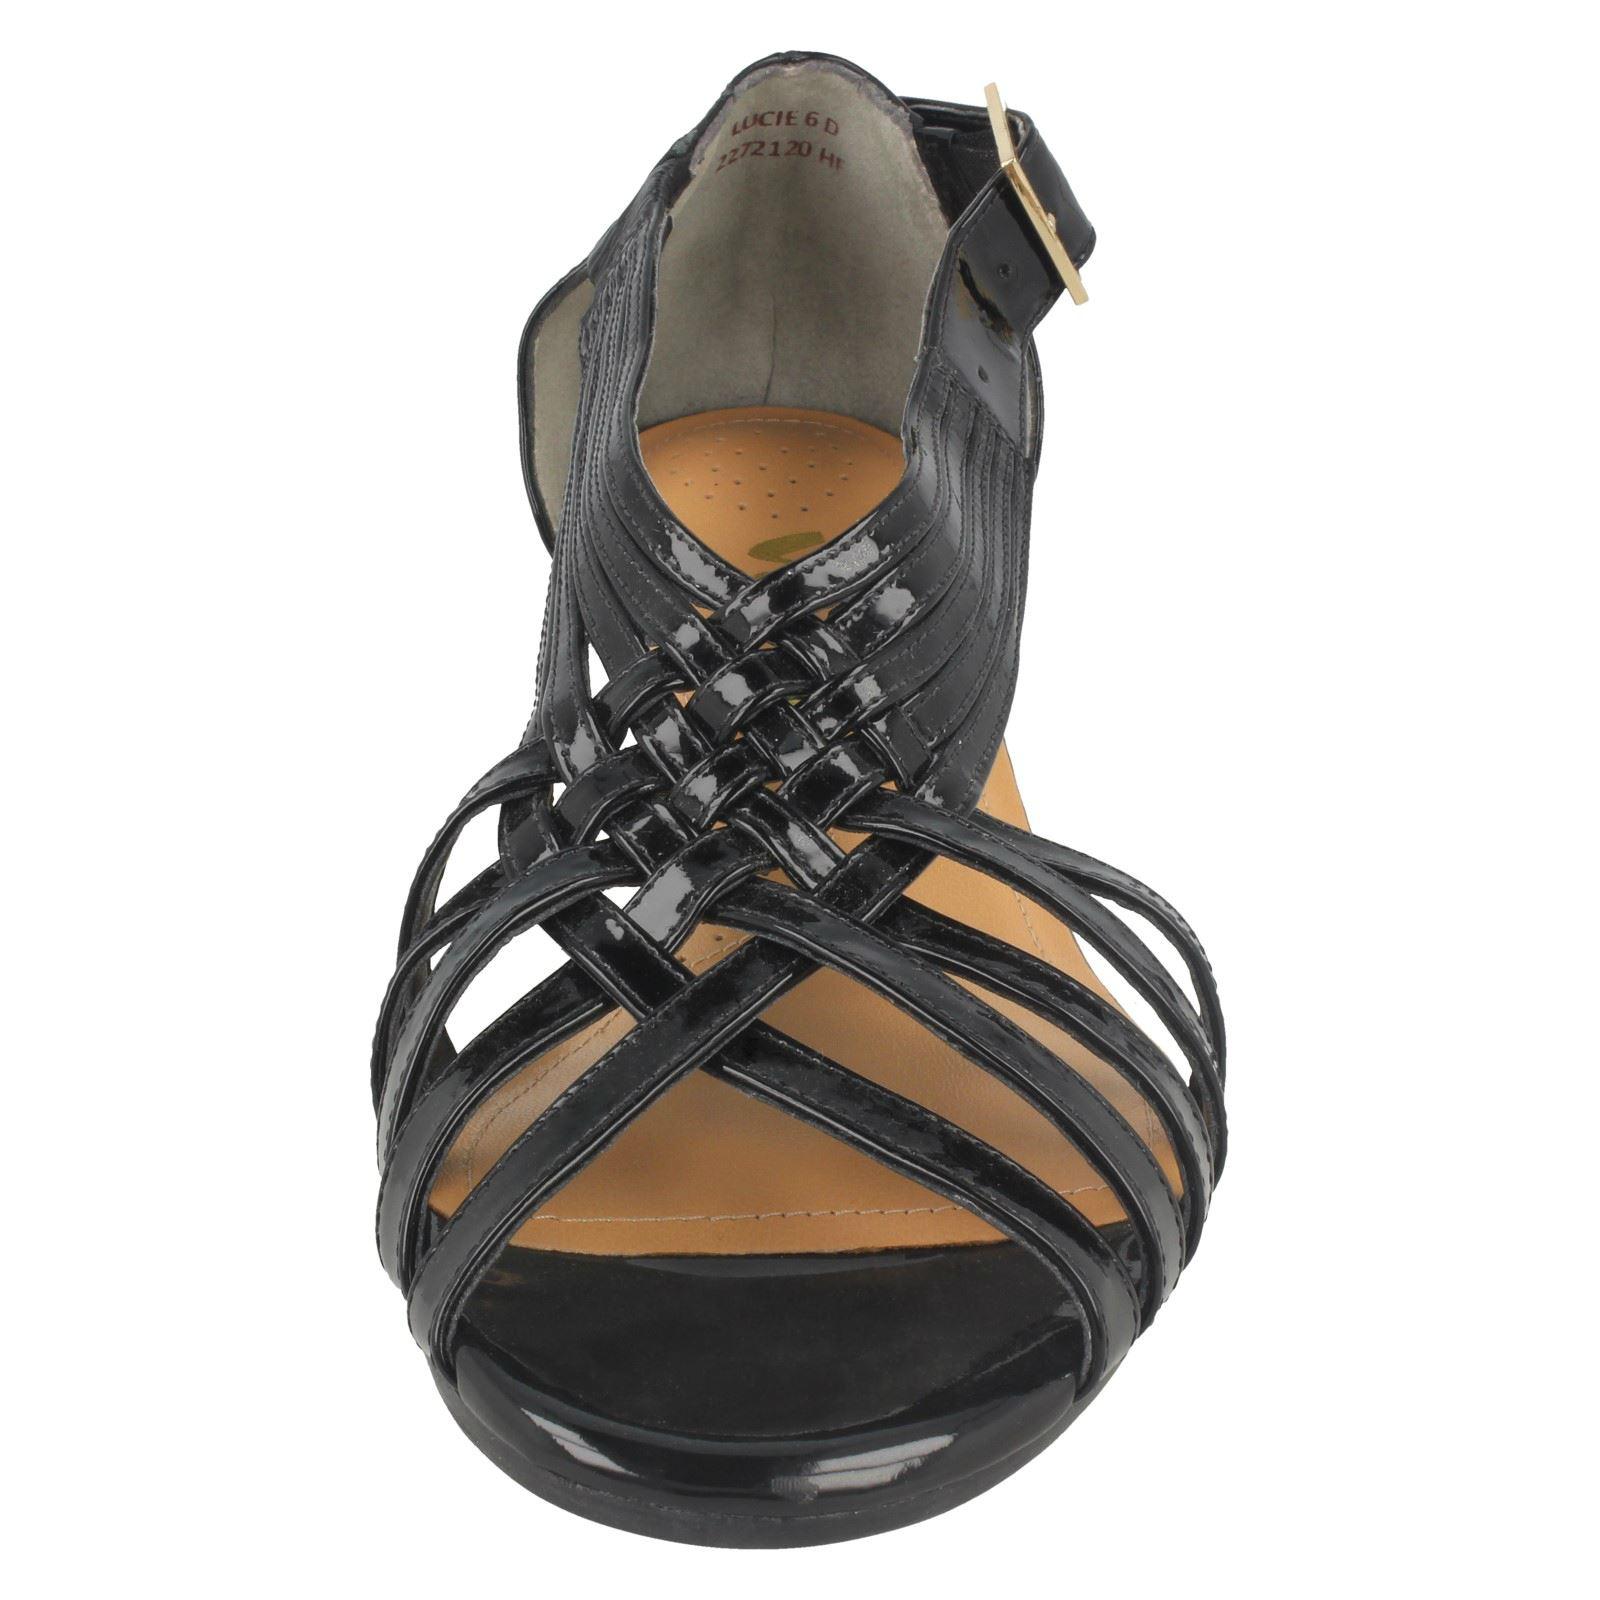 Ladies-Van-Dal-Wedge-Strappy-Sandals-Lucie thumbnail 6